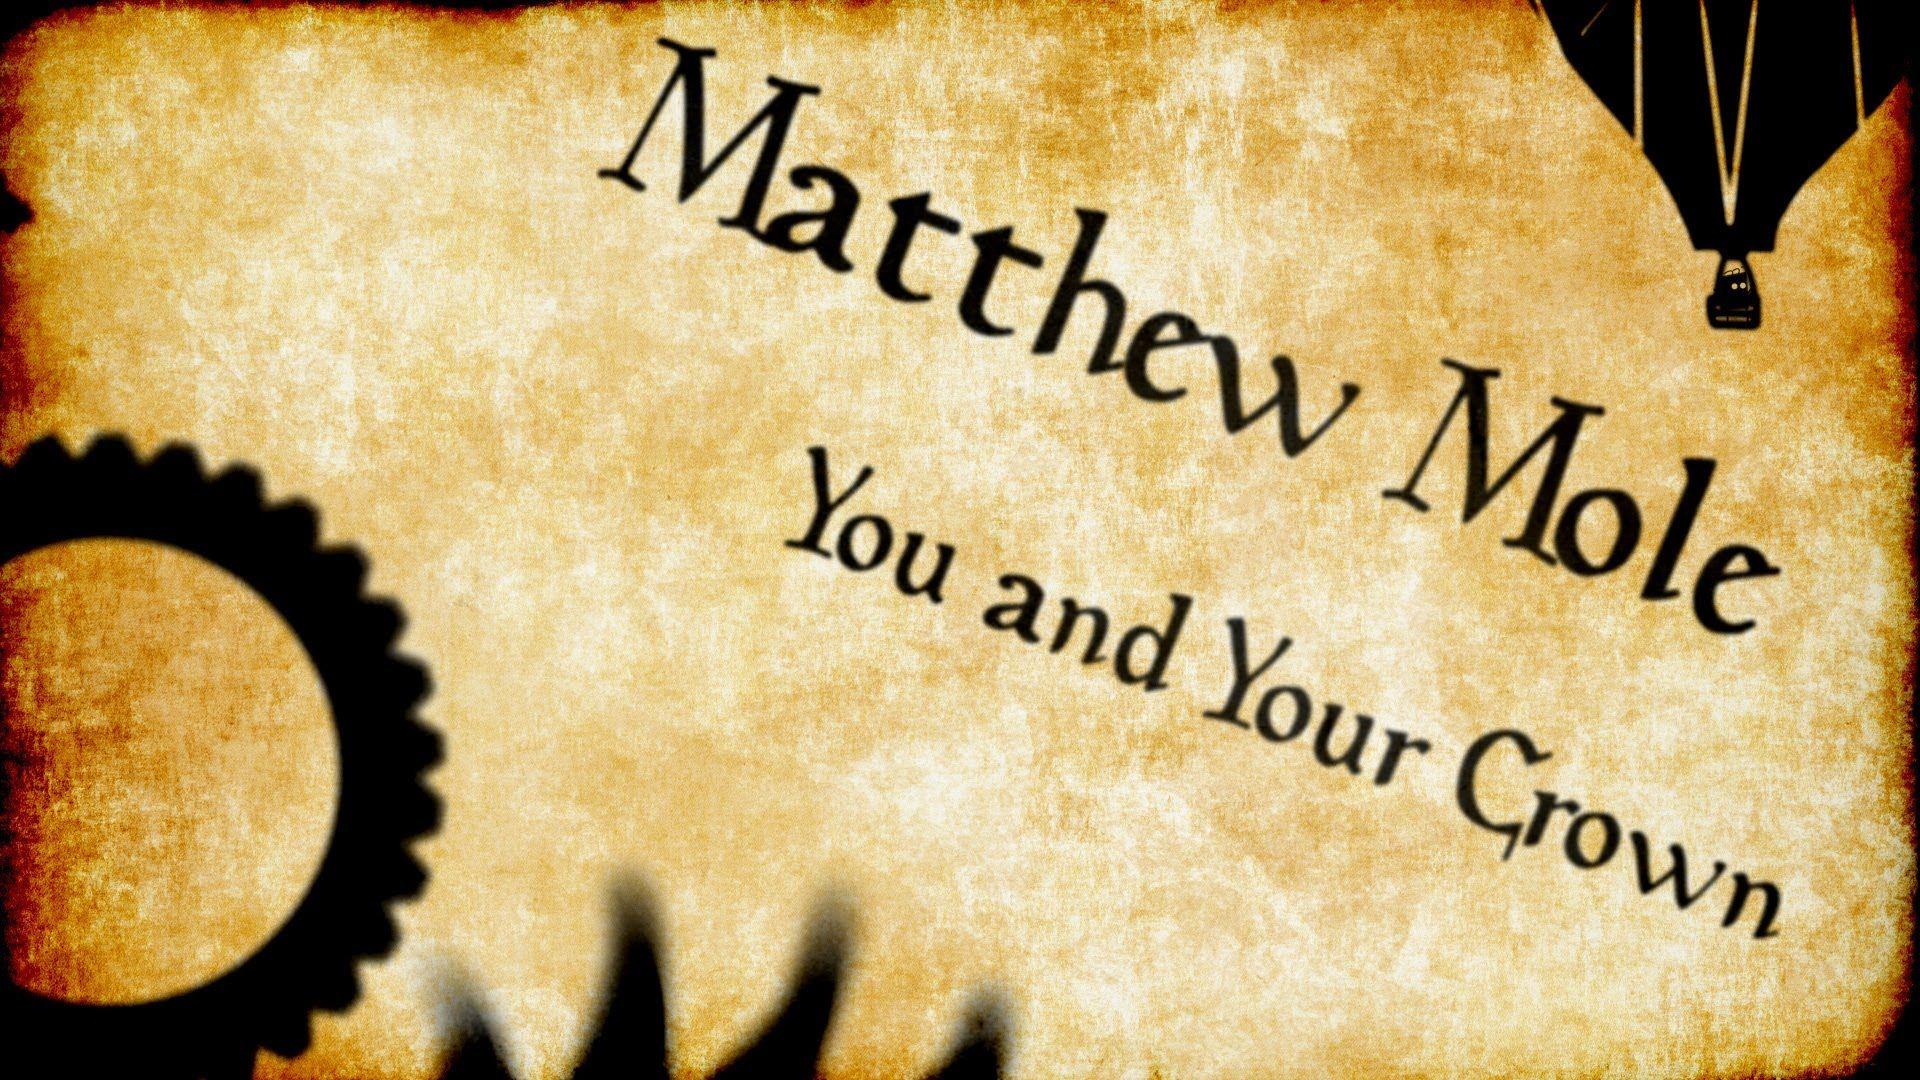 Matthew Mole You And Your Crown Lyric Video Lyrics Youtube